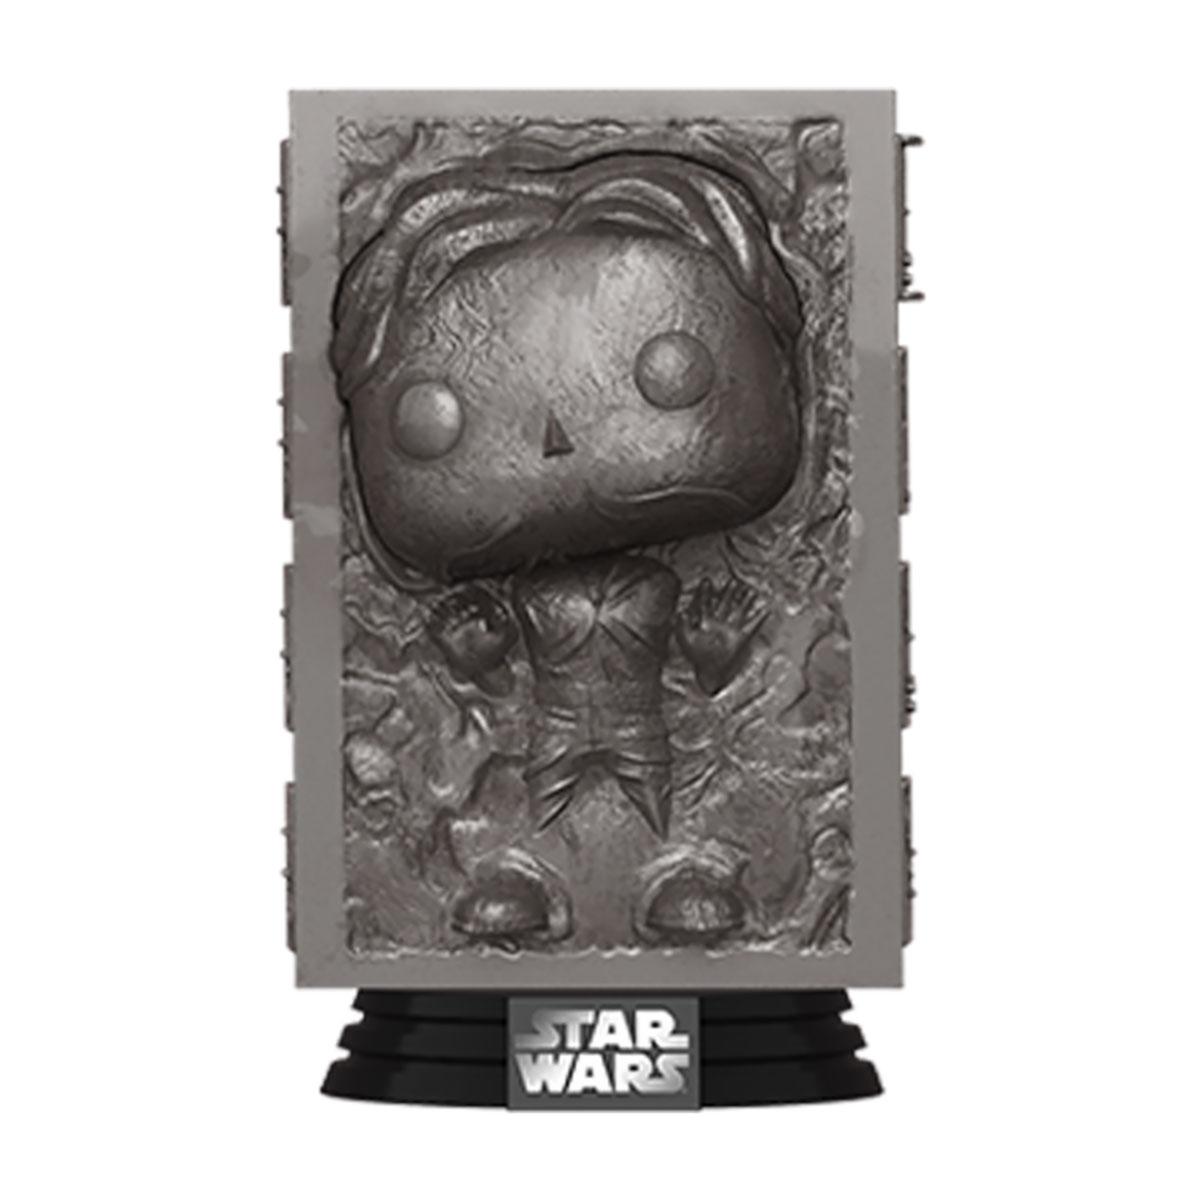 Star Wars POP! Movies Vinyl Figure Han in Carbonite Empire Strikes Back 40th Anniversary 9 cm